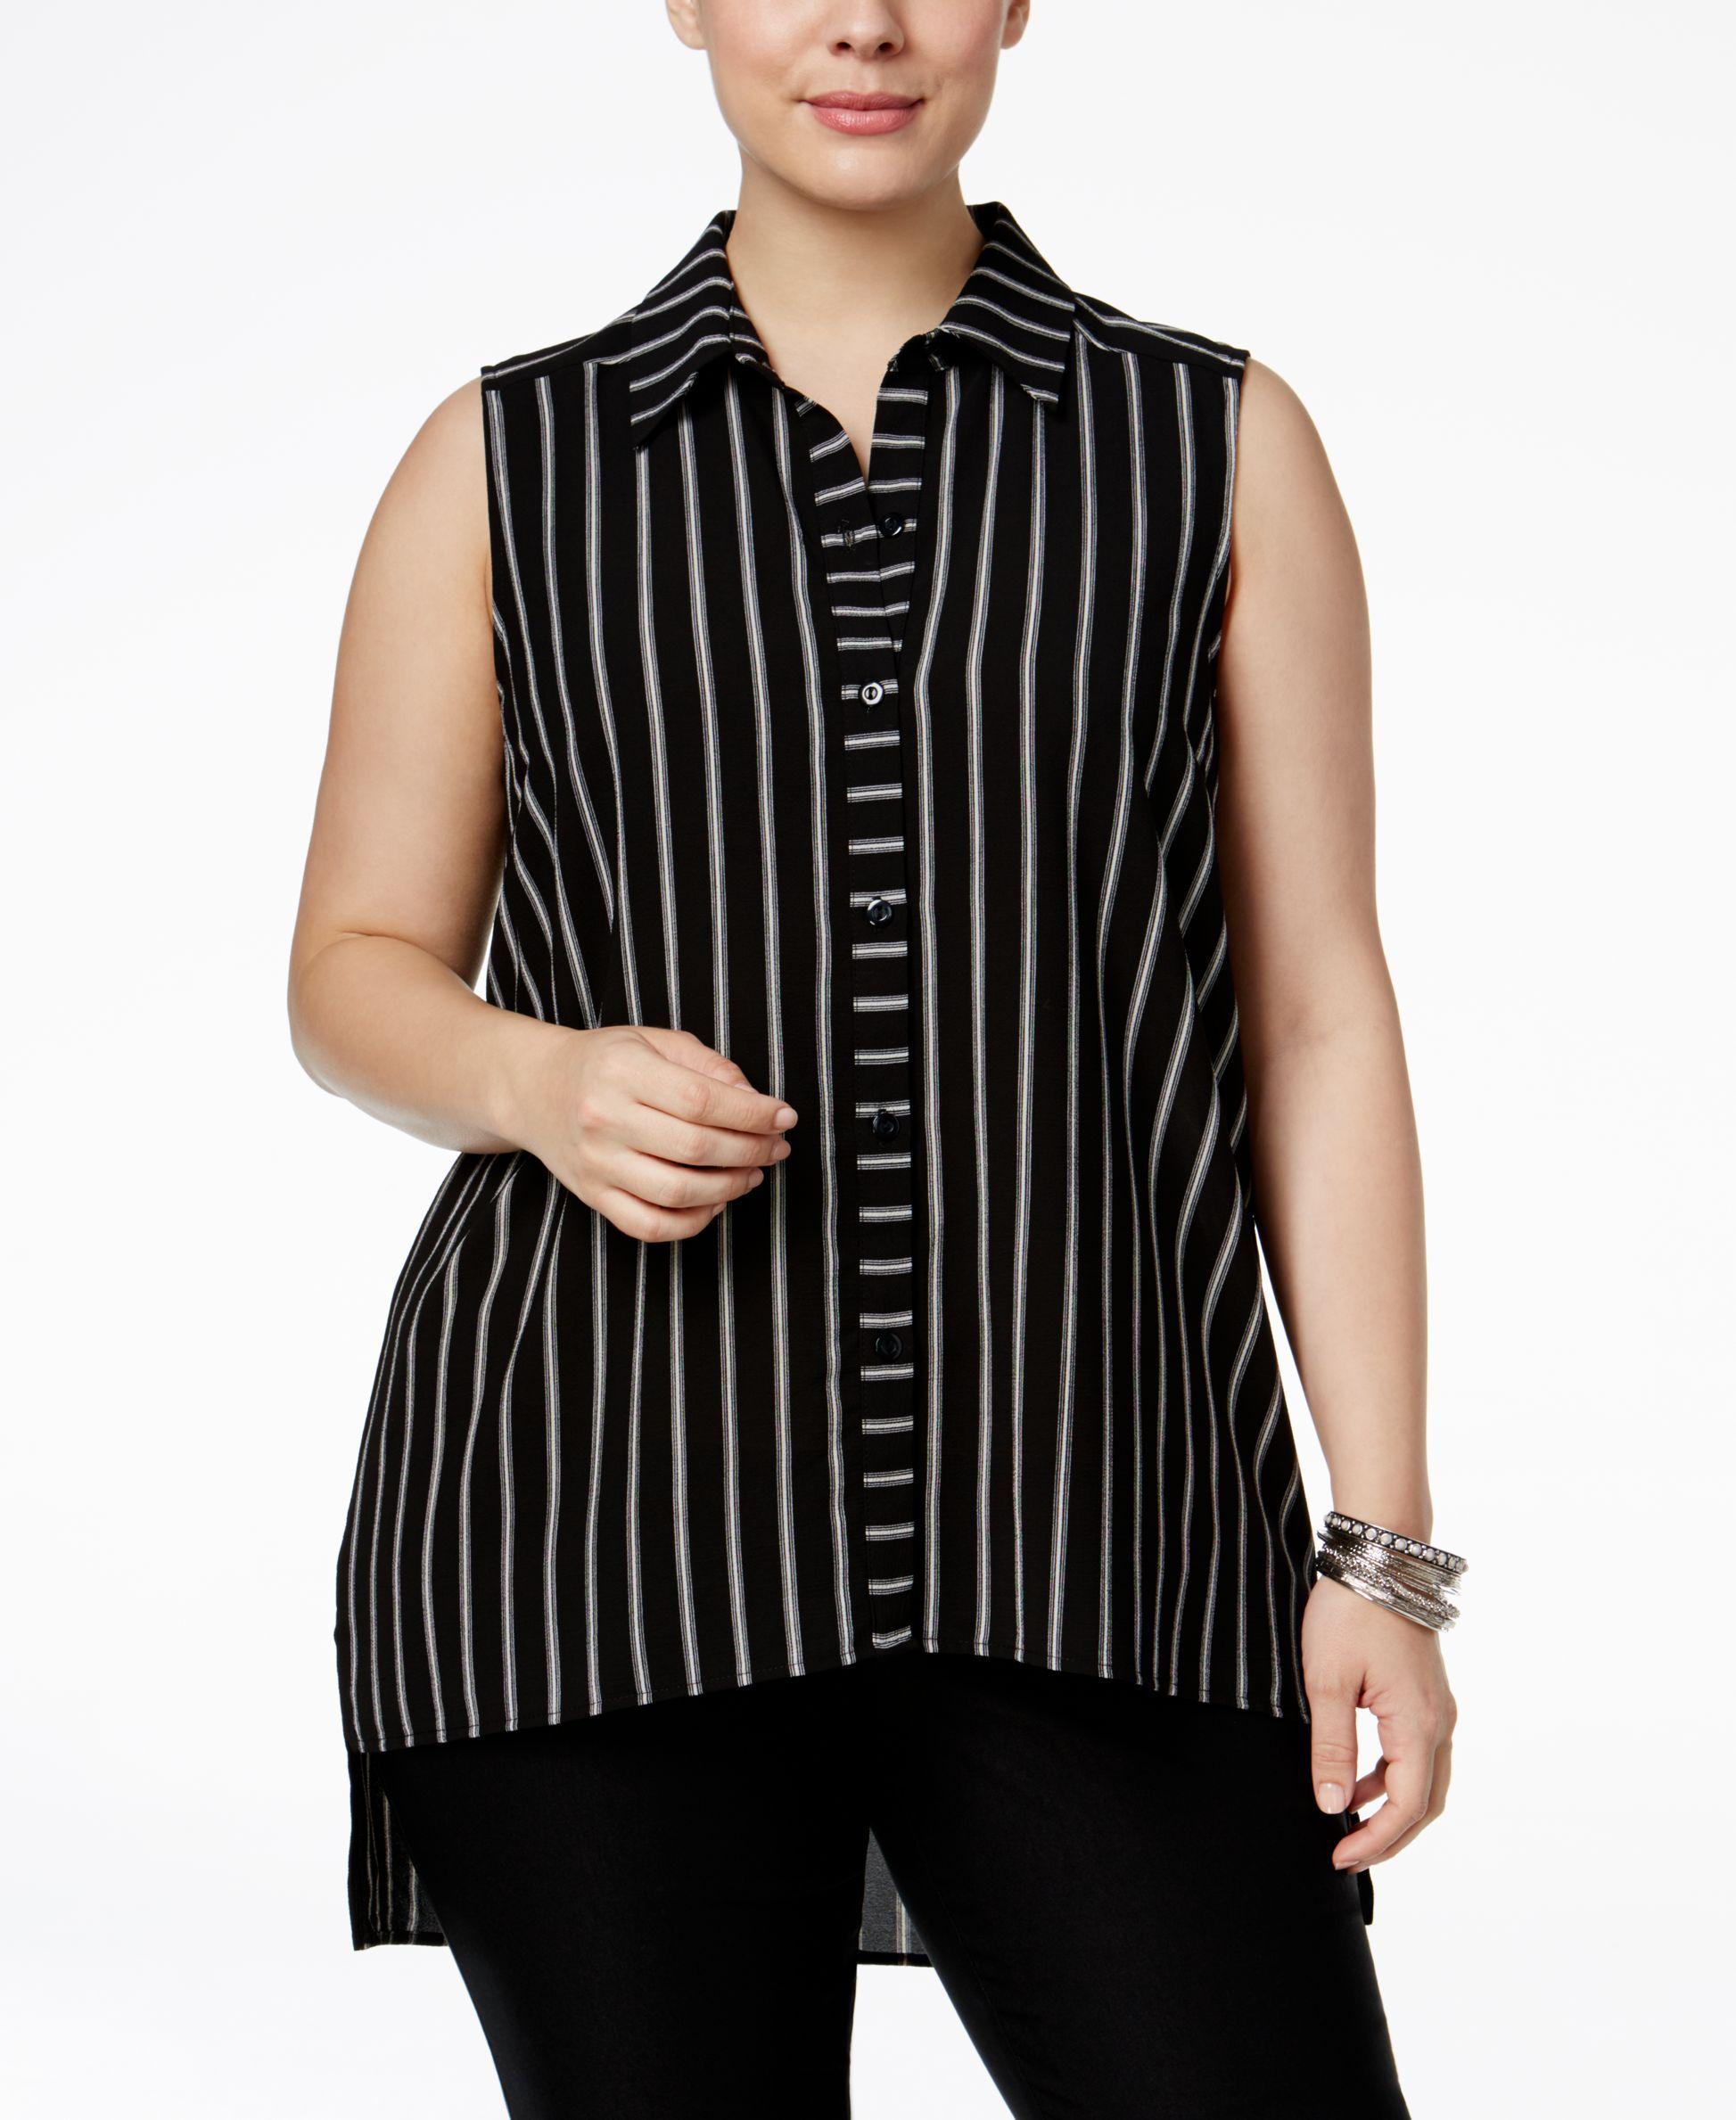 a09a3984bea Monteau Trendy Plus Size Striped Blouse